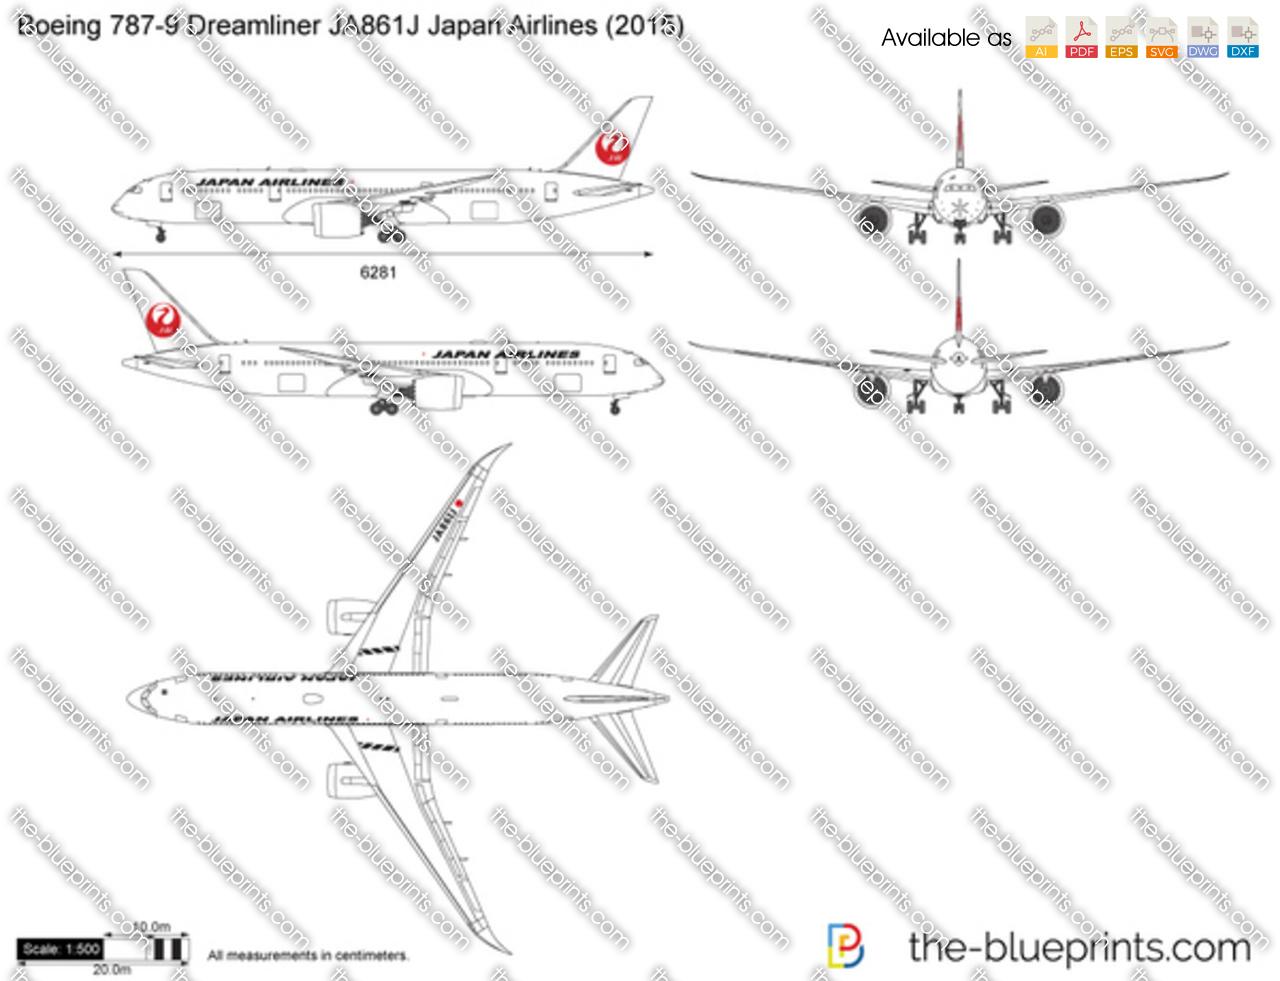 Boeing 787-9 Dreamliner JA861J Japan Airlines 2018